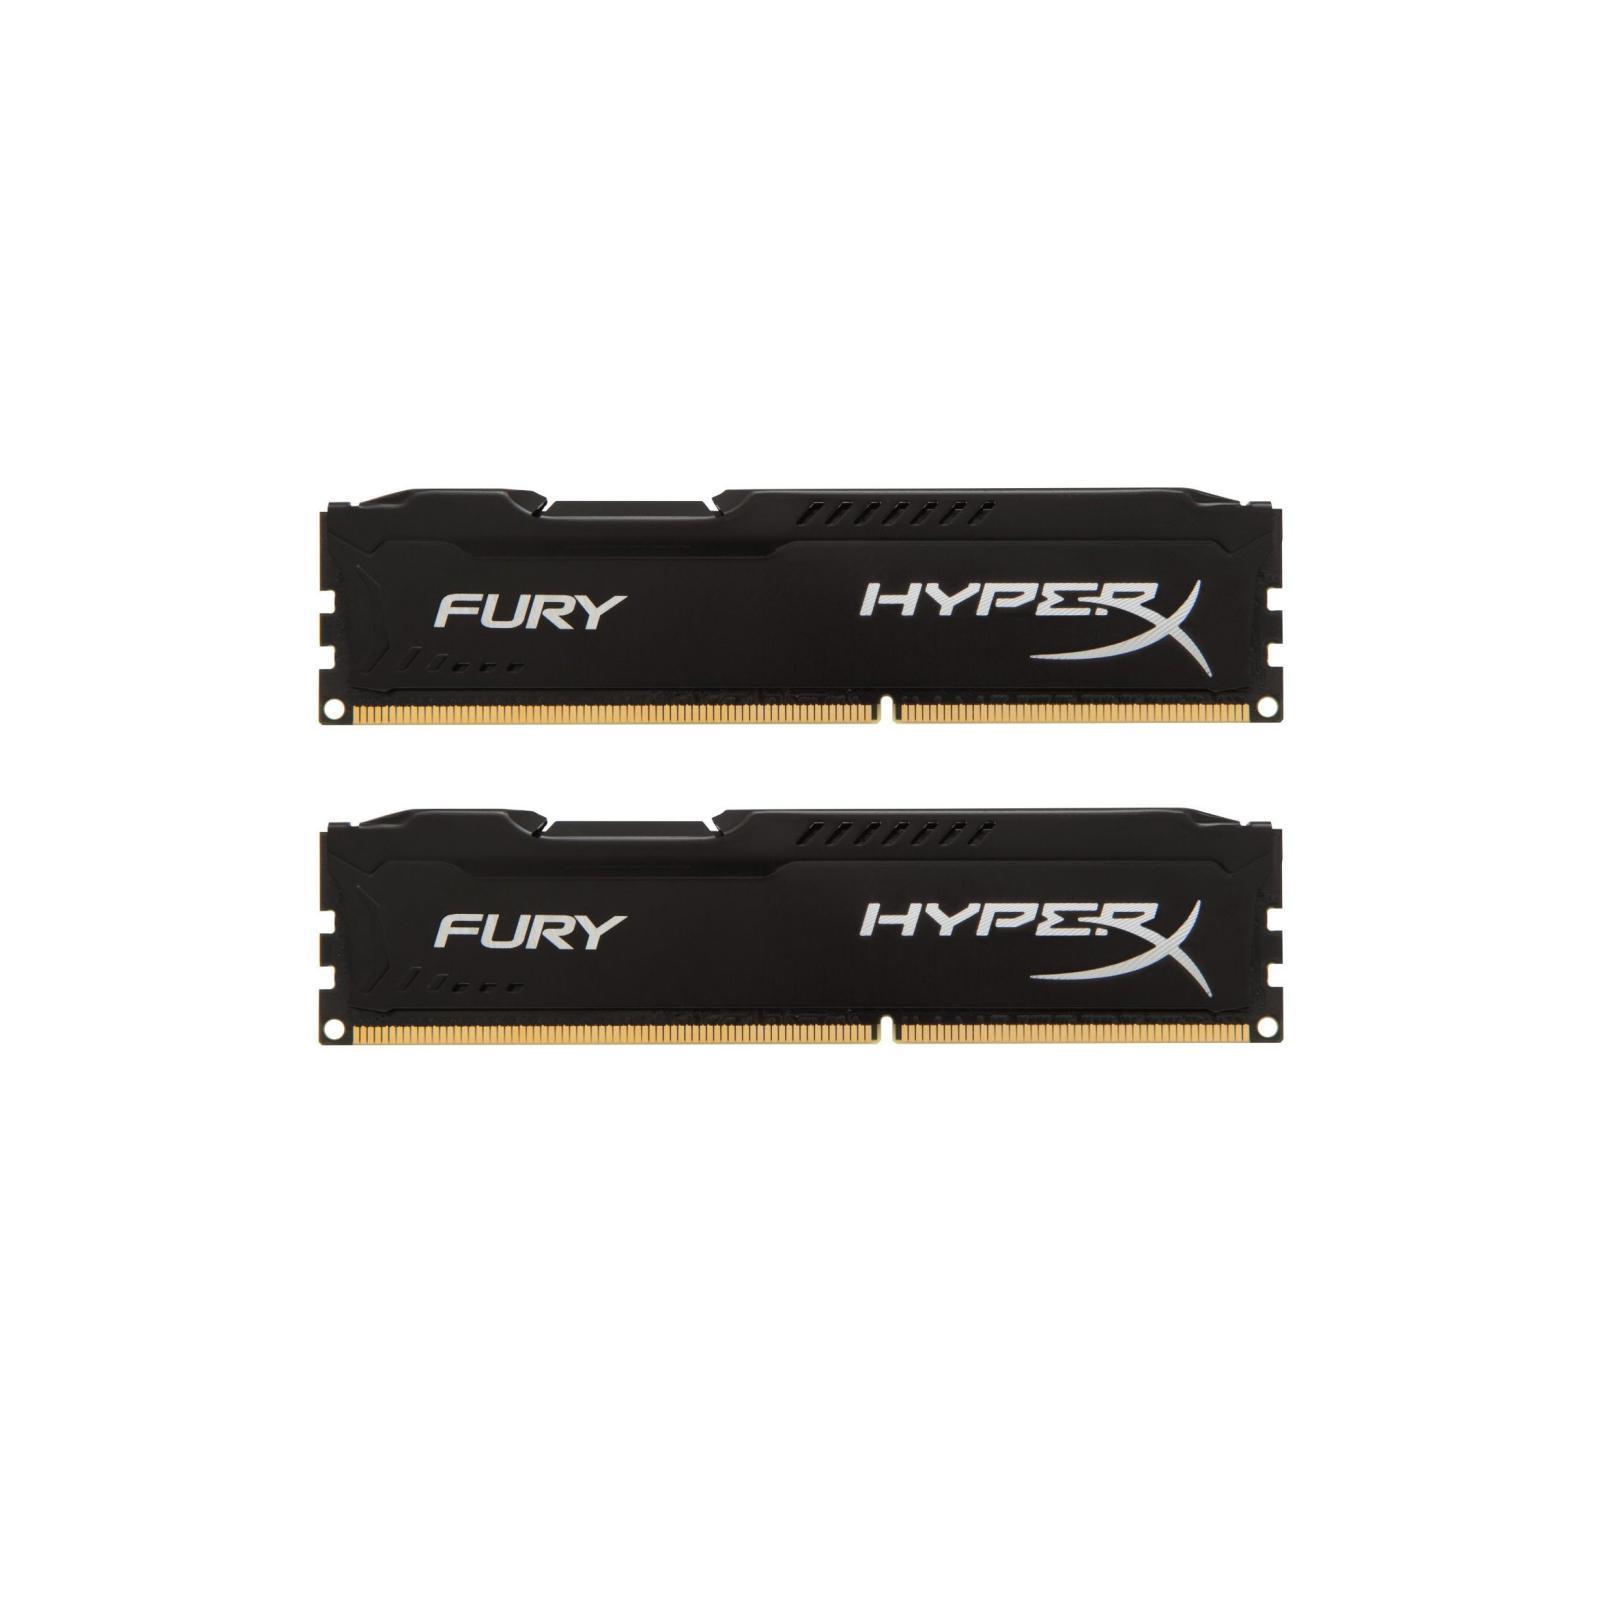 Модуль памяти для компьютера DDR4 16GB (2x8GB) 2933 MHz HyperX FURY Black HyperX (Kingston Fury) (HX429C17FB2K2/16)